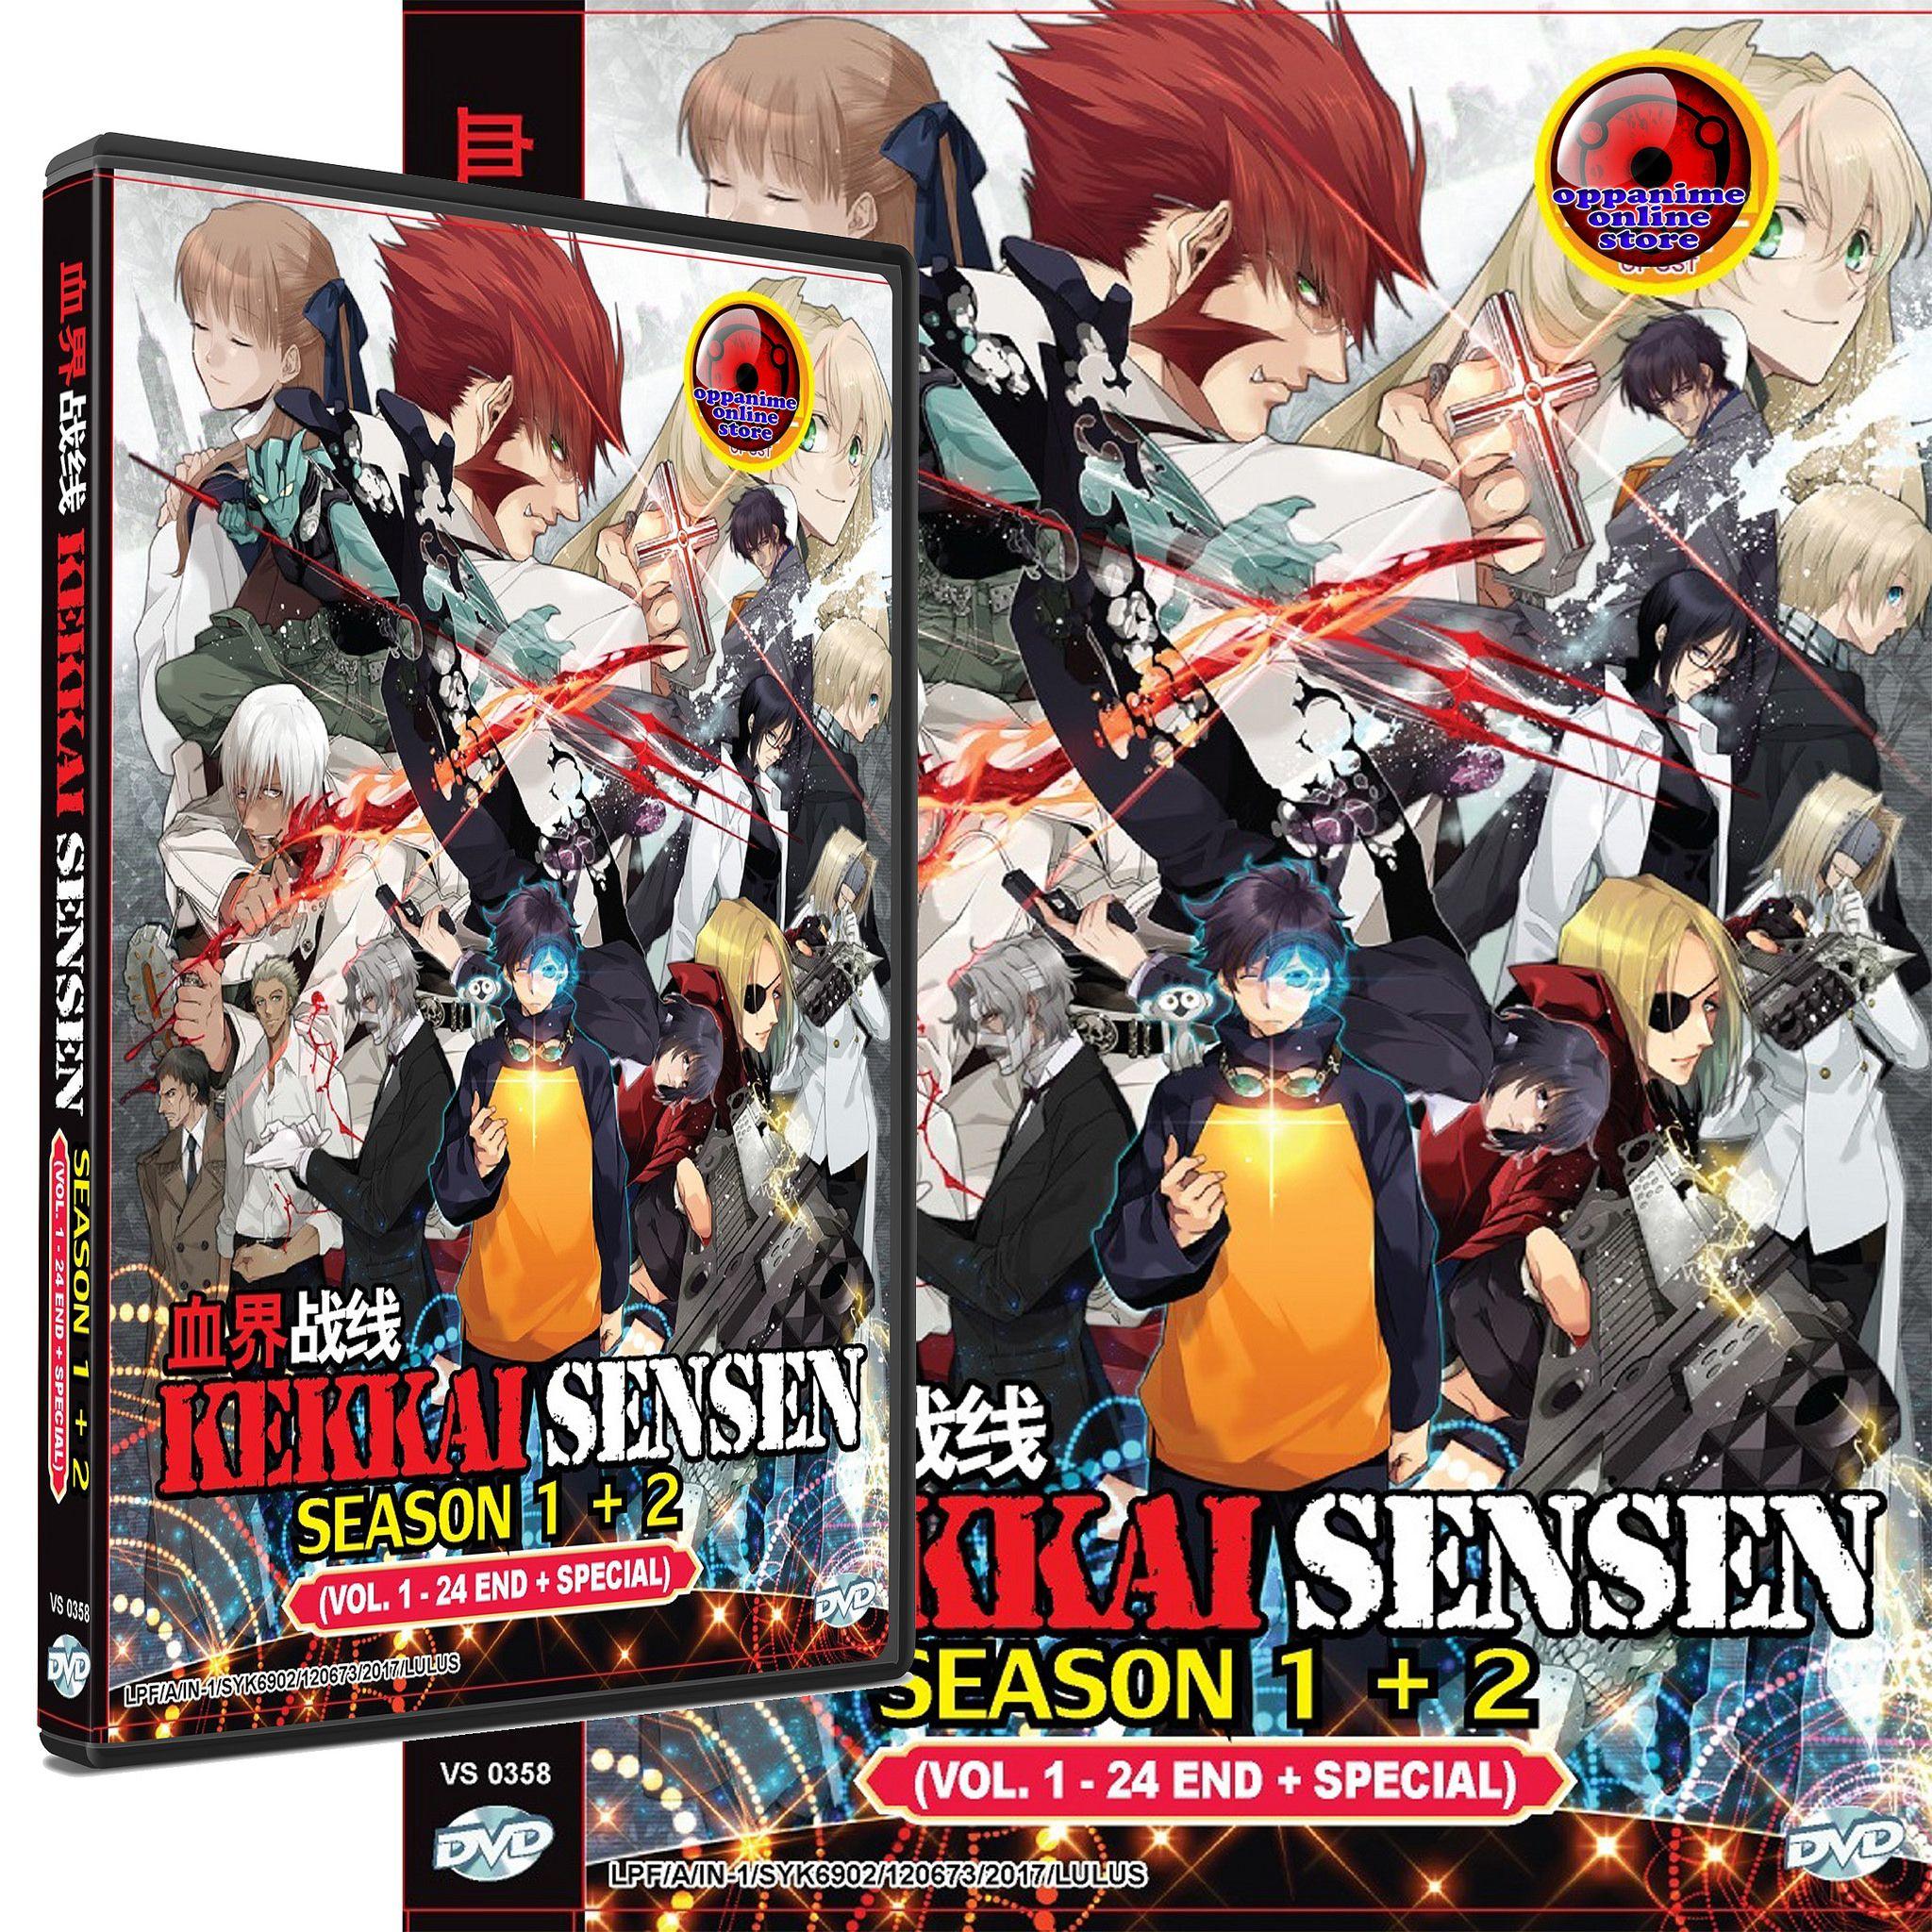 Kekkai Sensen Season 1 +2 Vol.124 End + SP English